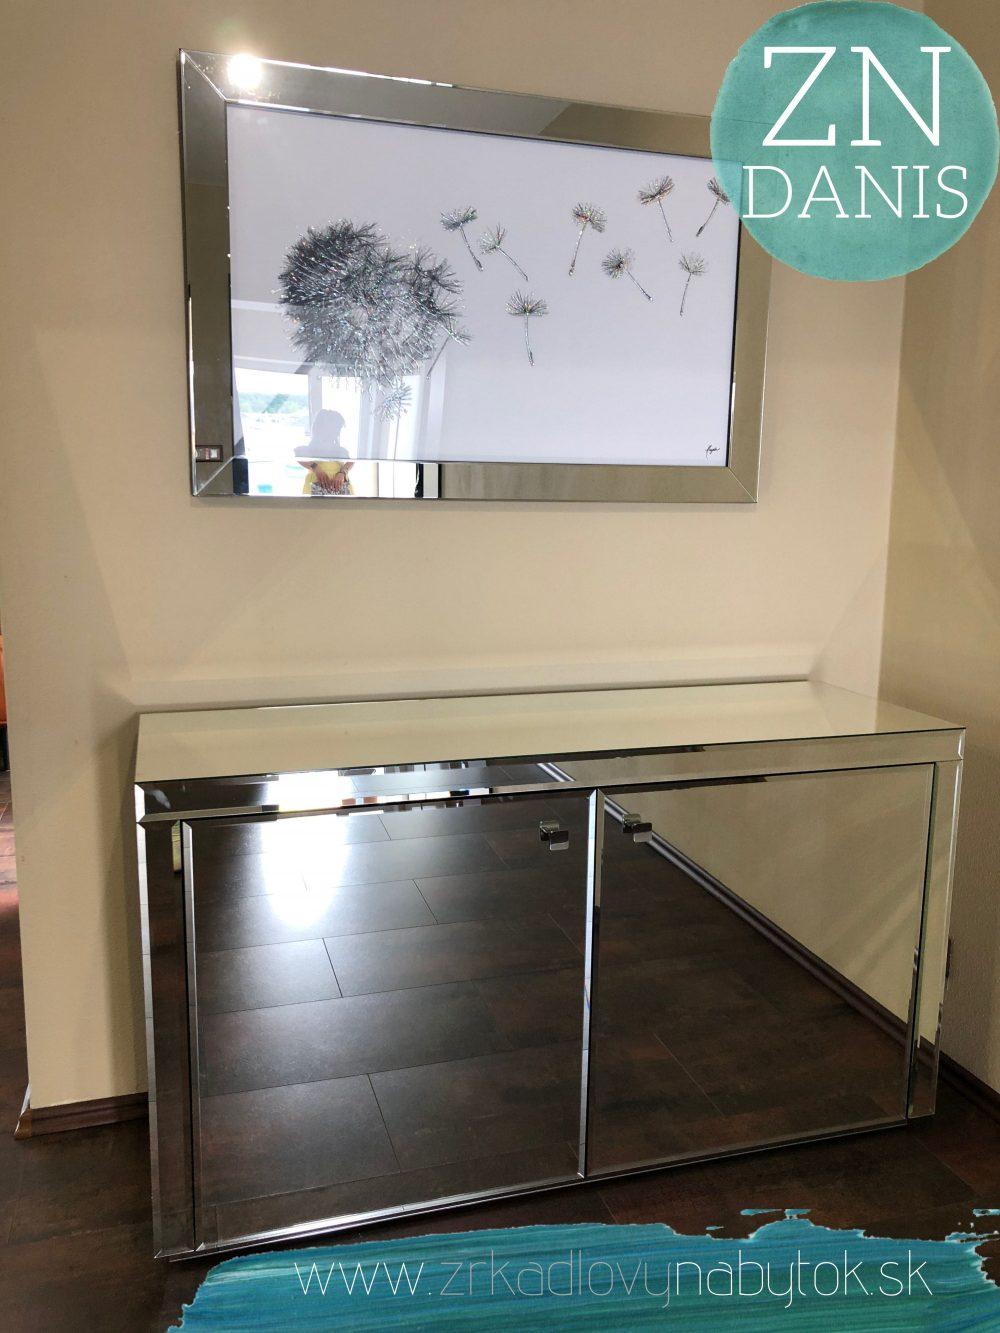 Copy of ZNDANIS-16-min